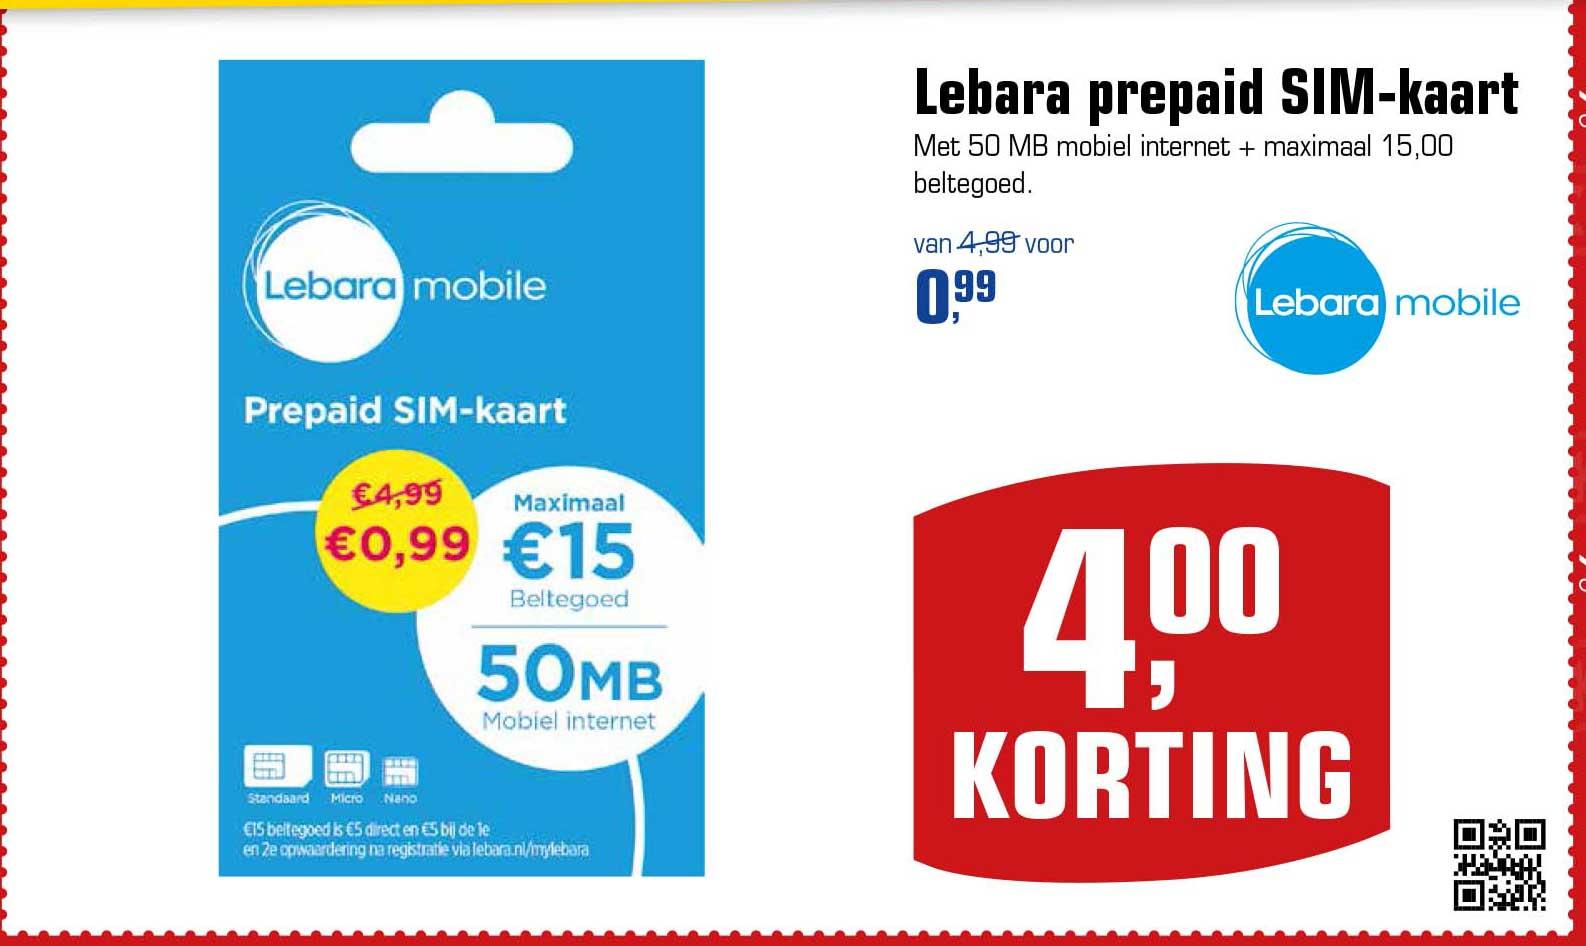 Primera Lebara Prepaid Sim Kaart: €4,- Korting